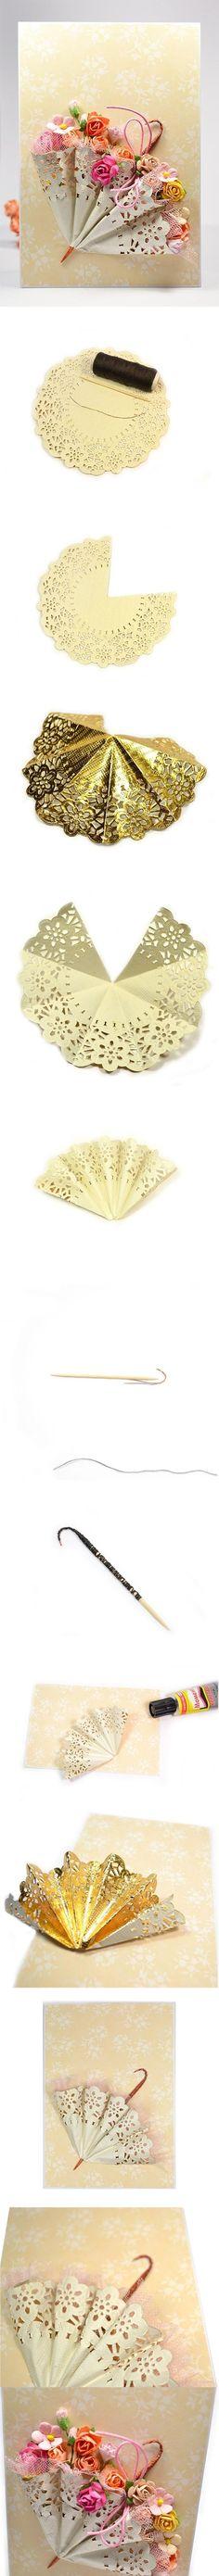 DIY Cute Mini Umbrella with Paper Doily | www.FabArtDIY.com LIKE Us on Facebook ==> https://www.facebook.com/FabArtDIY